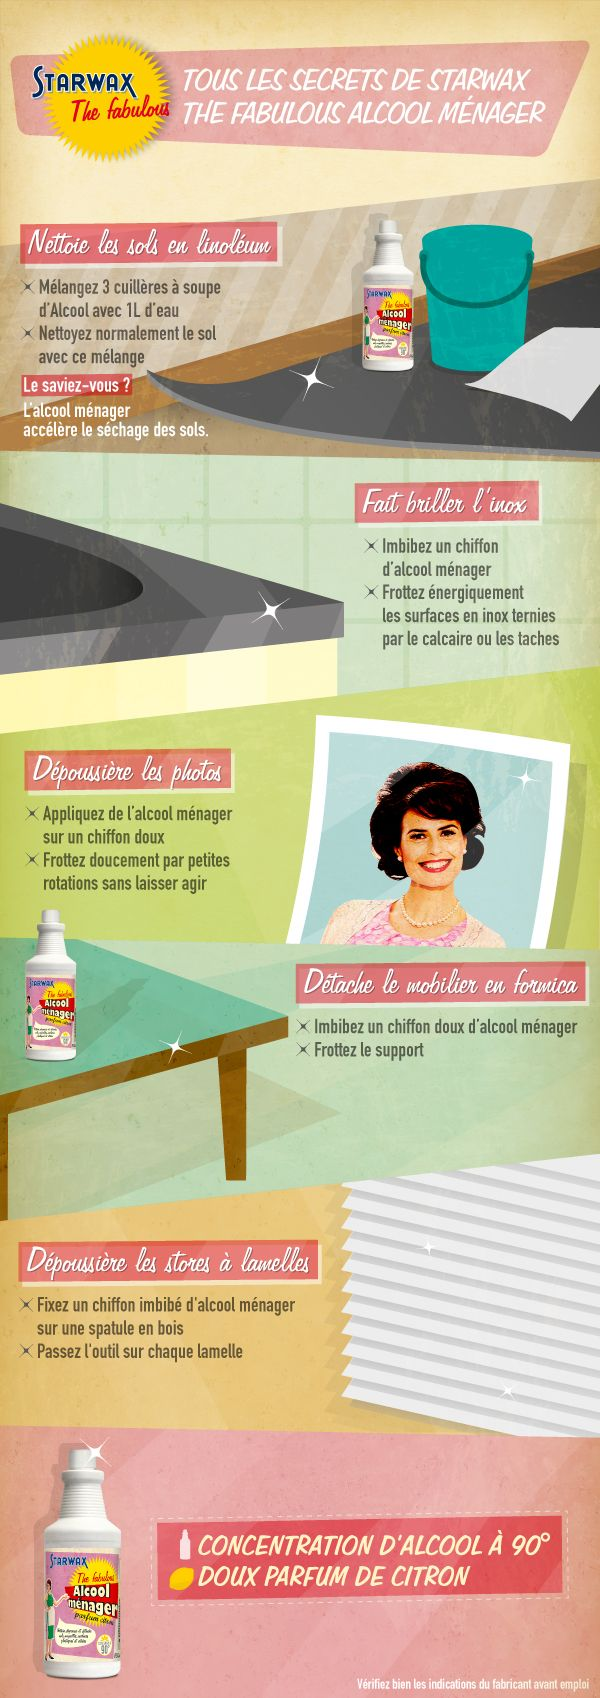 ♥ Pinterest : Mutine Lolita ♥ Les secrets de l'alcool ménager #astucieux